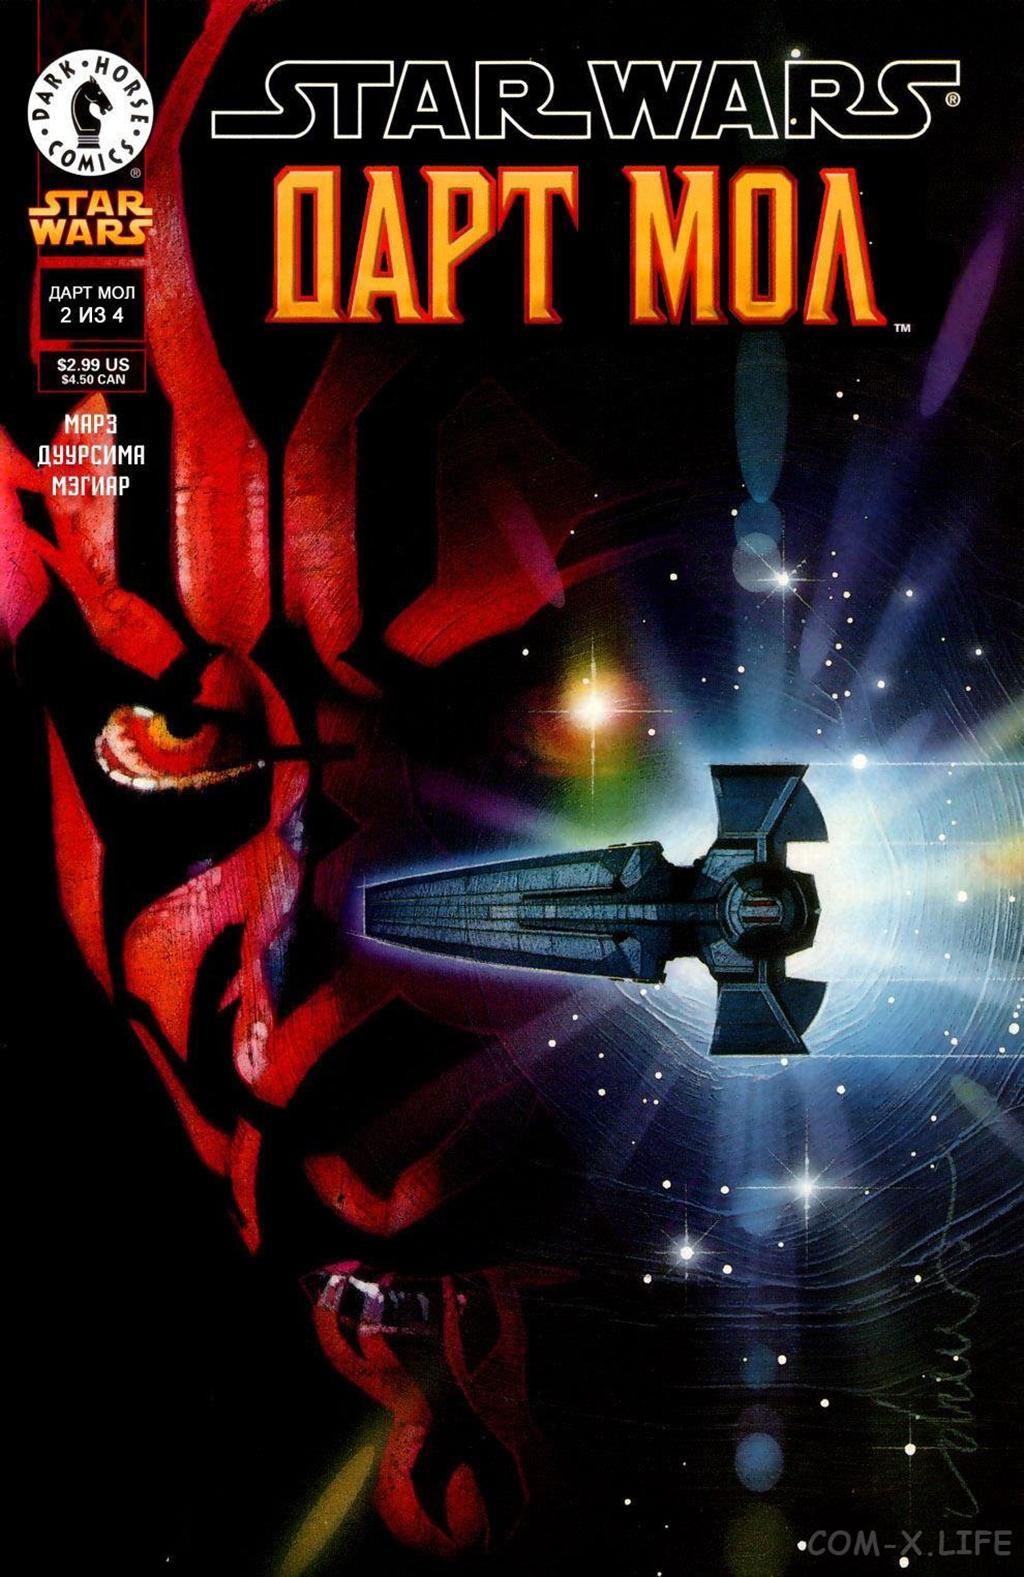 Комикс Звёздные войны - Дарт Мол